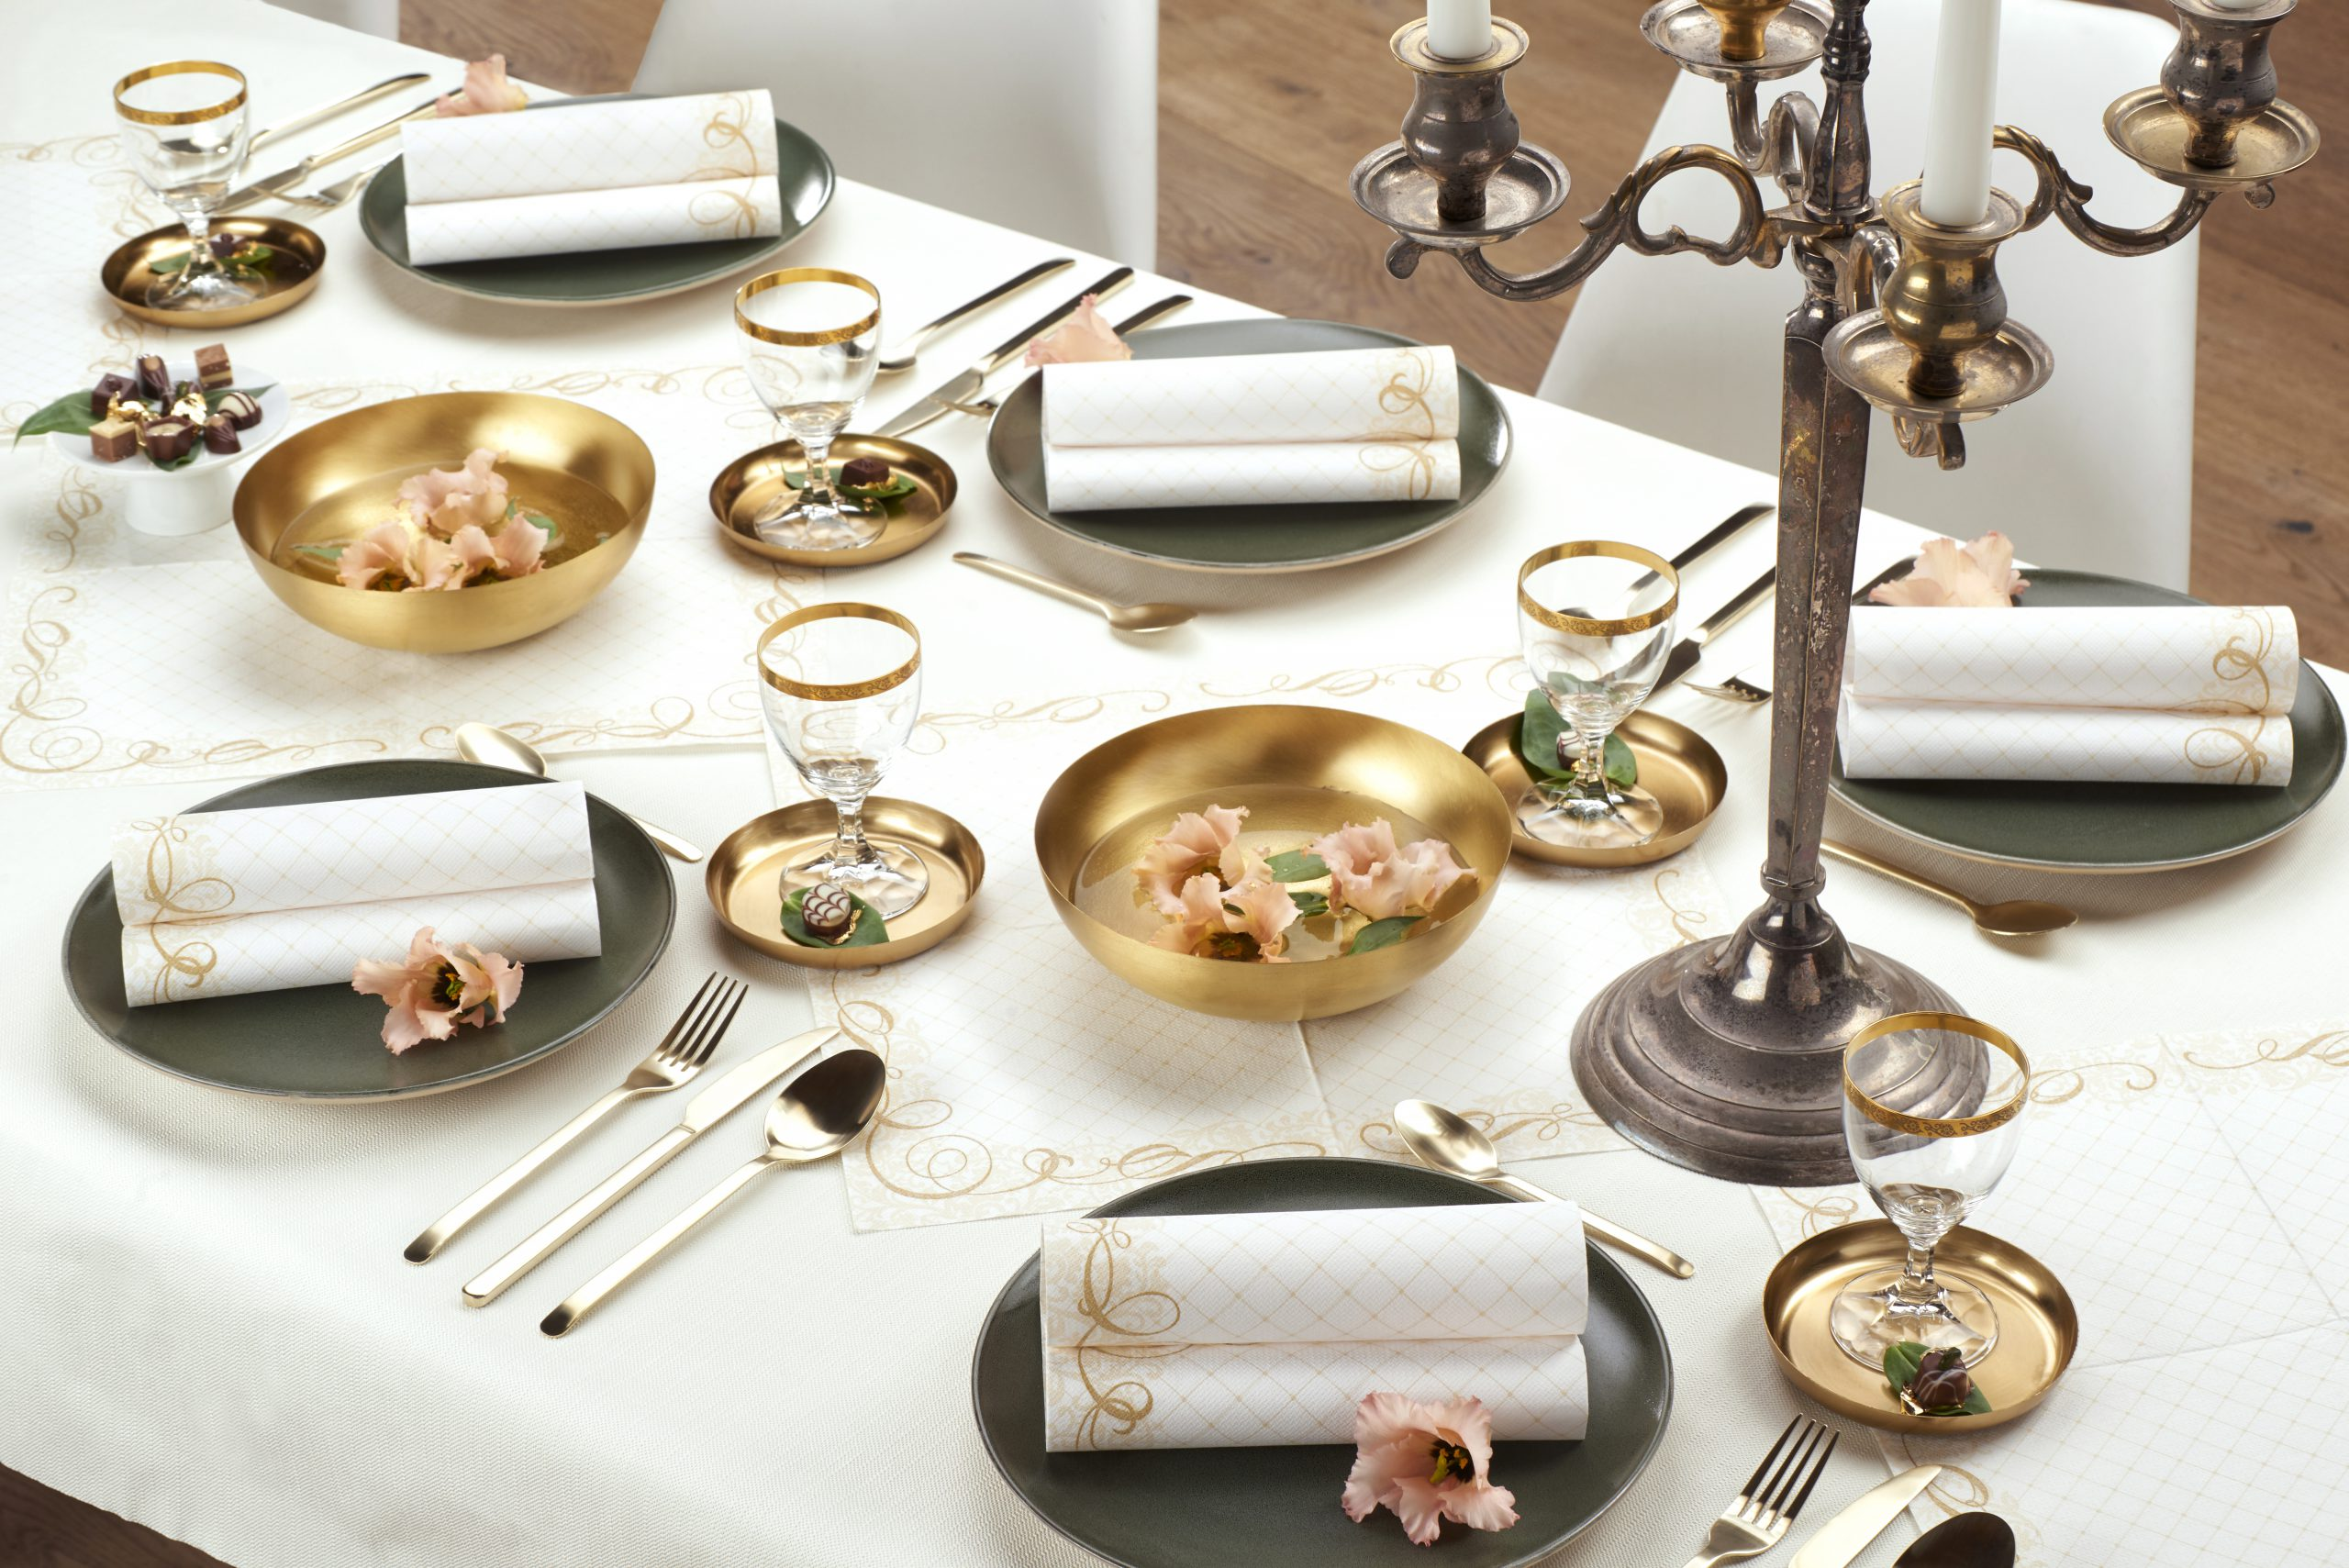 Thema-goud-tafelaankleding-speciale-evenementen-conpax